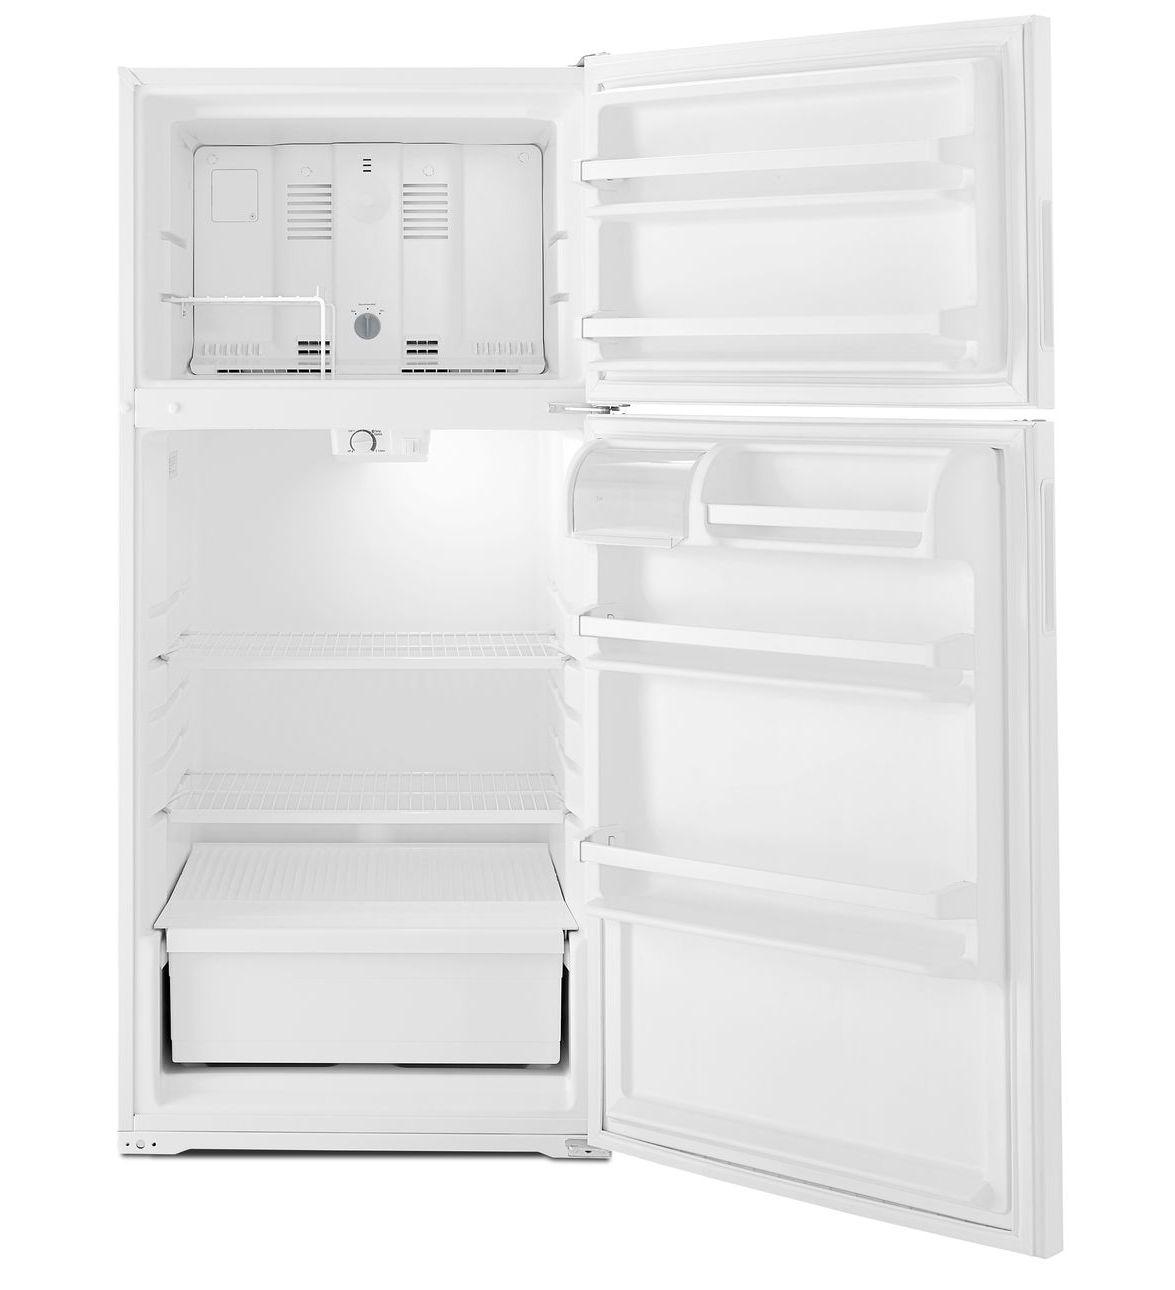 Art104tfdw Amana 174 14 Cu Ft Top Freezer Refrigerator